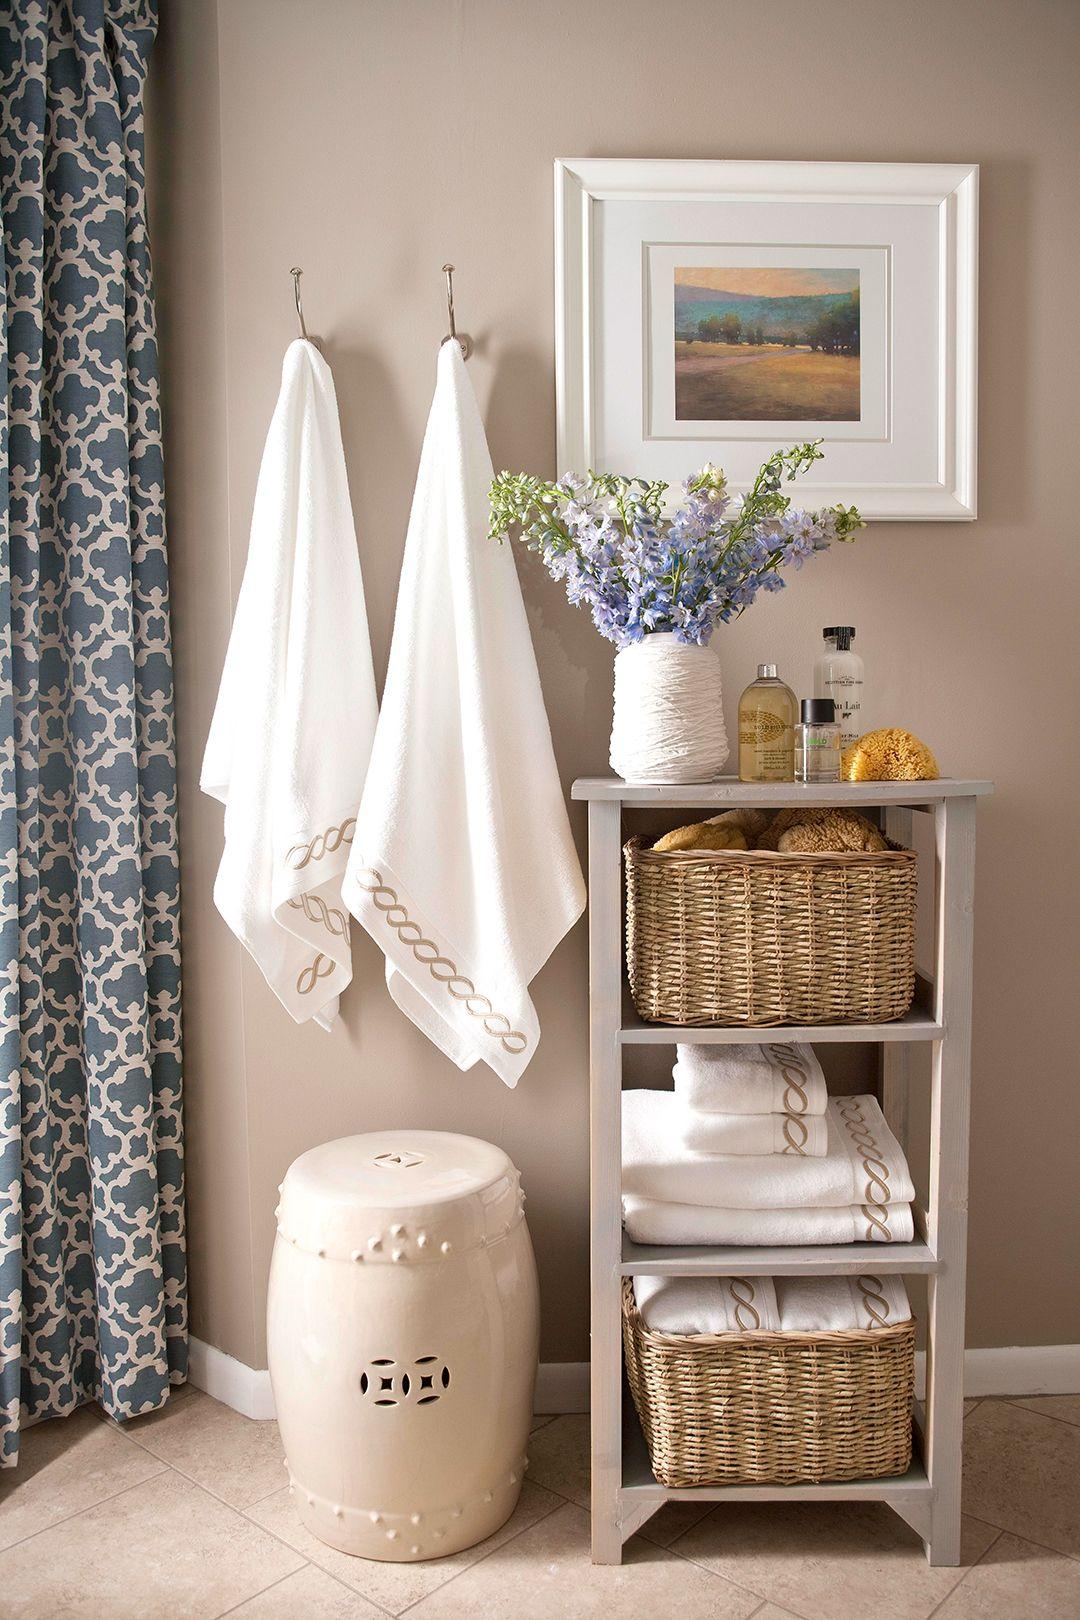 10 Ideas What Color Should I Paint My Bathroom Walls Should Be Small Bathroom Colors Best Bathroom Paint Colors Painting Bathroom